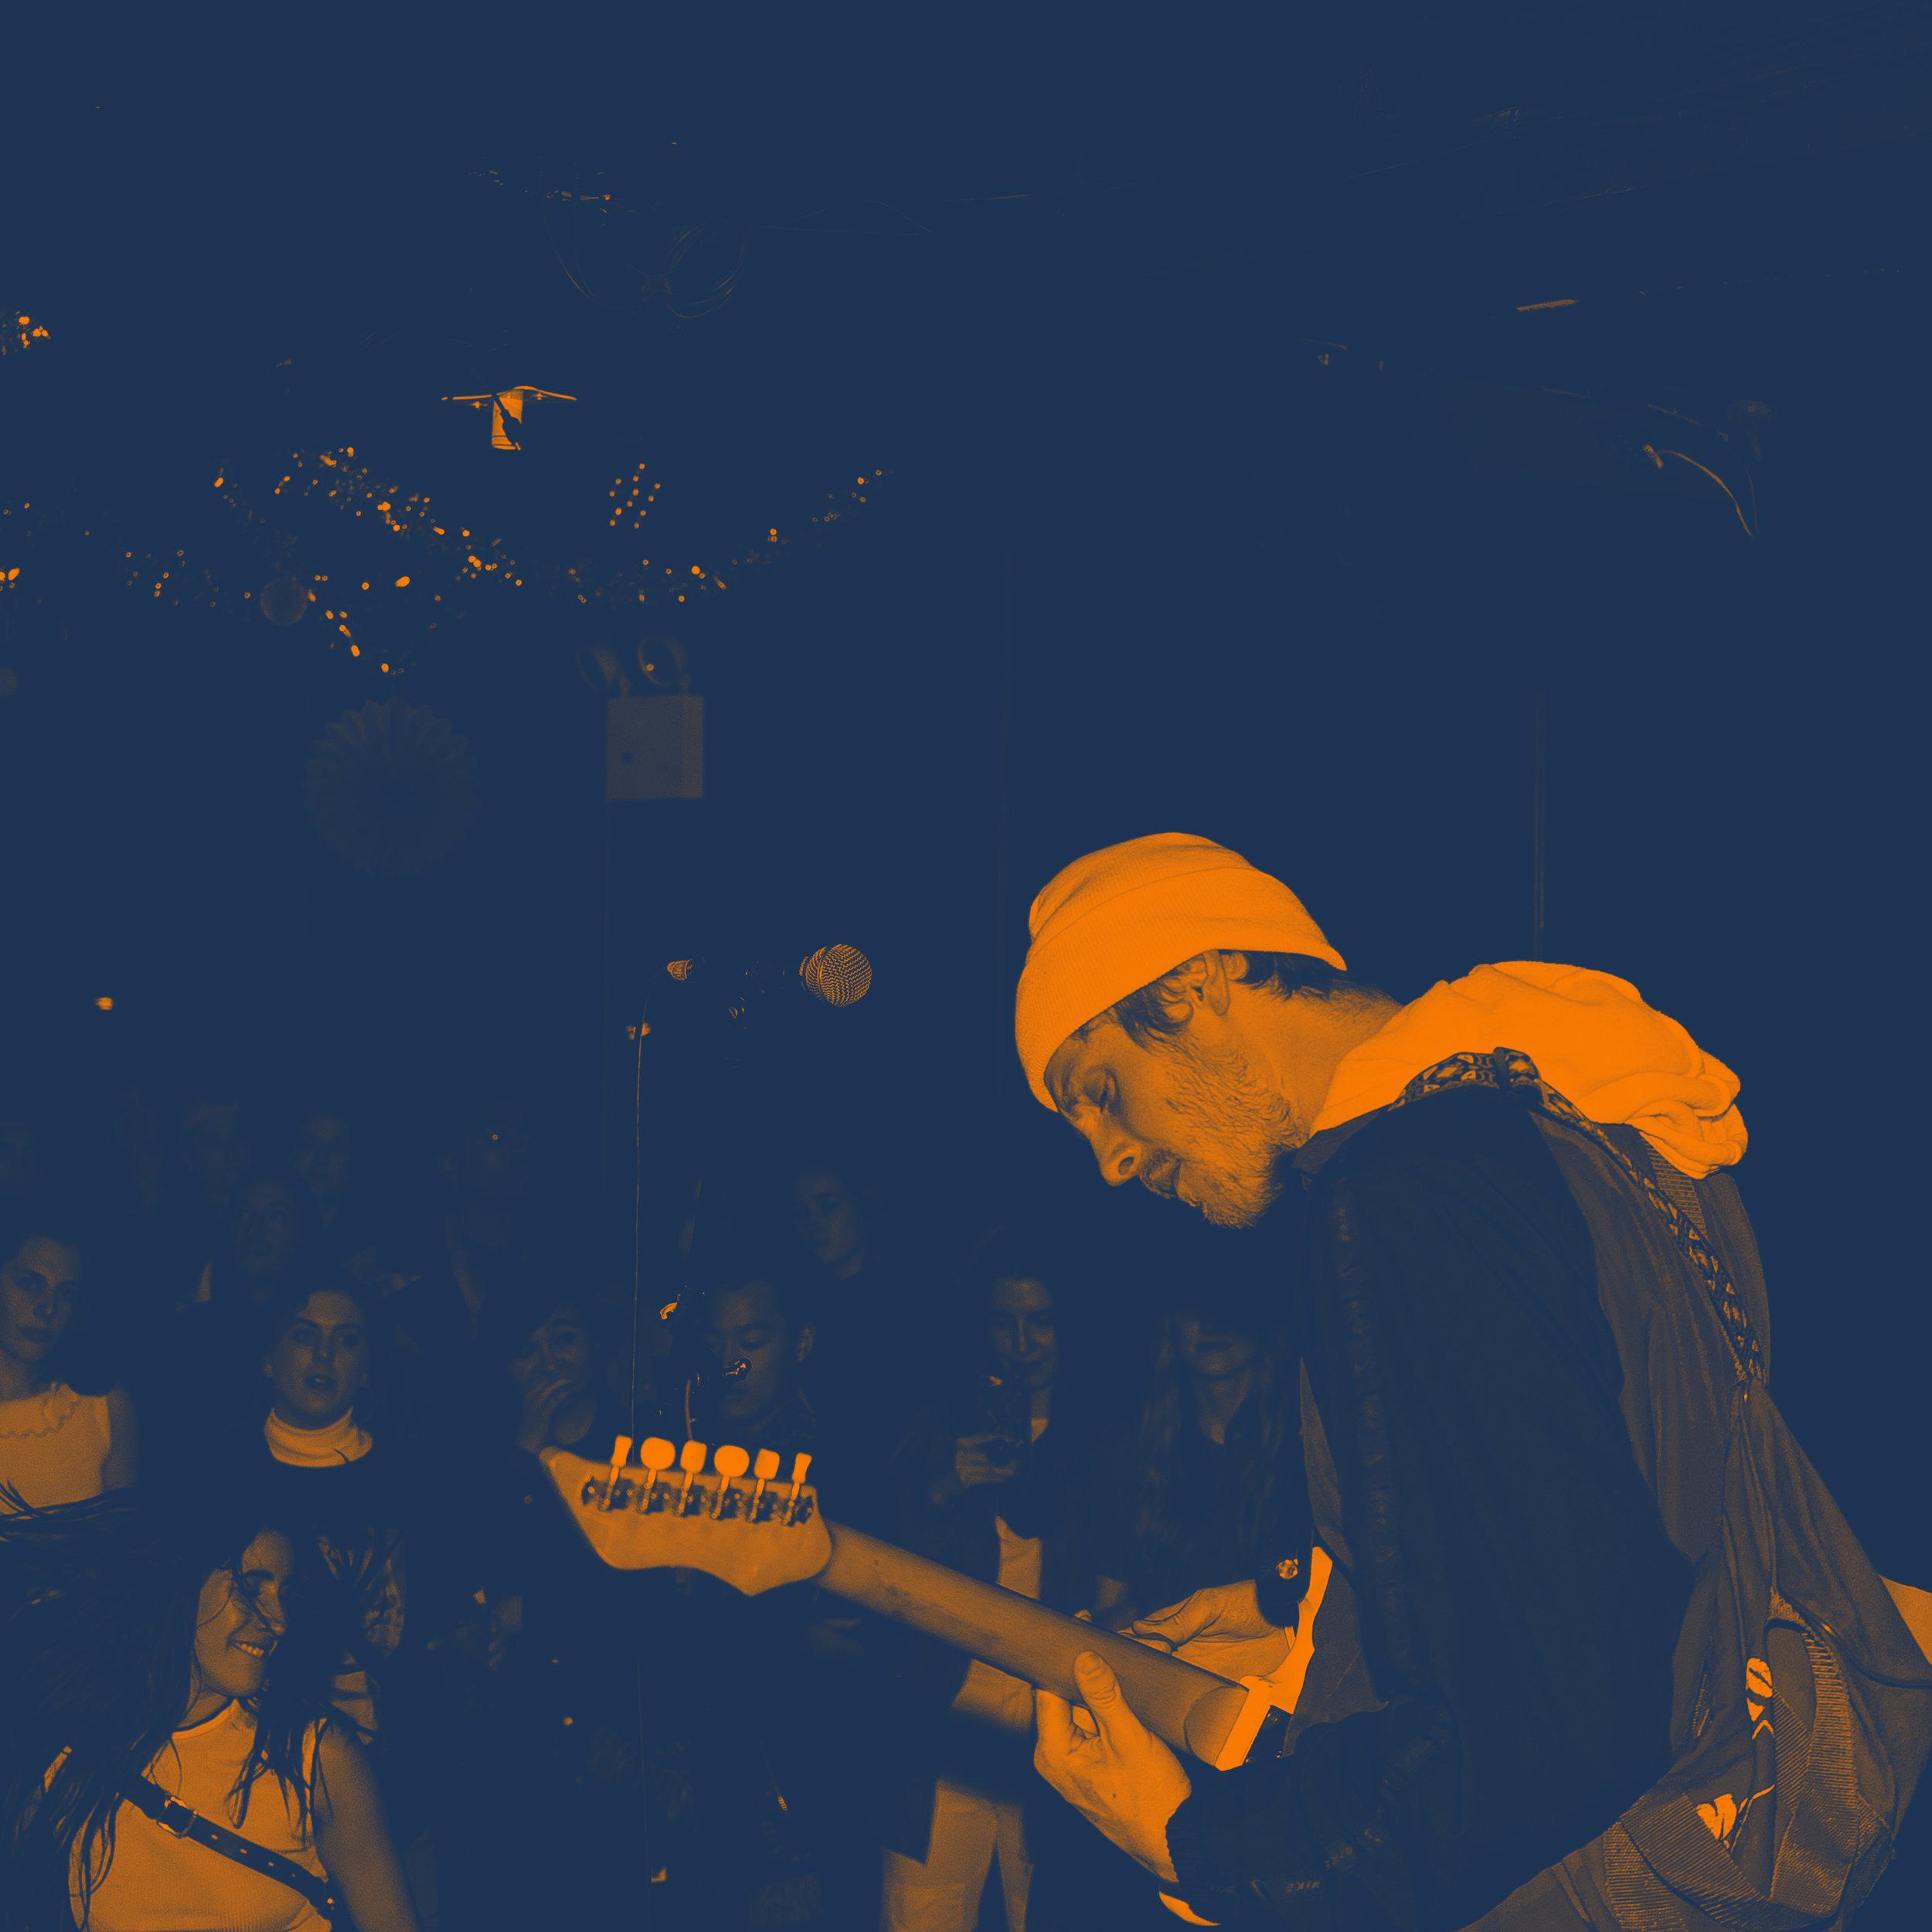 invert rocknroll (blue orange).jpg